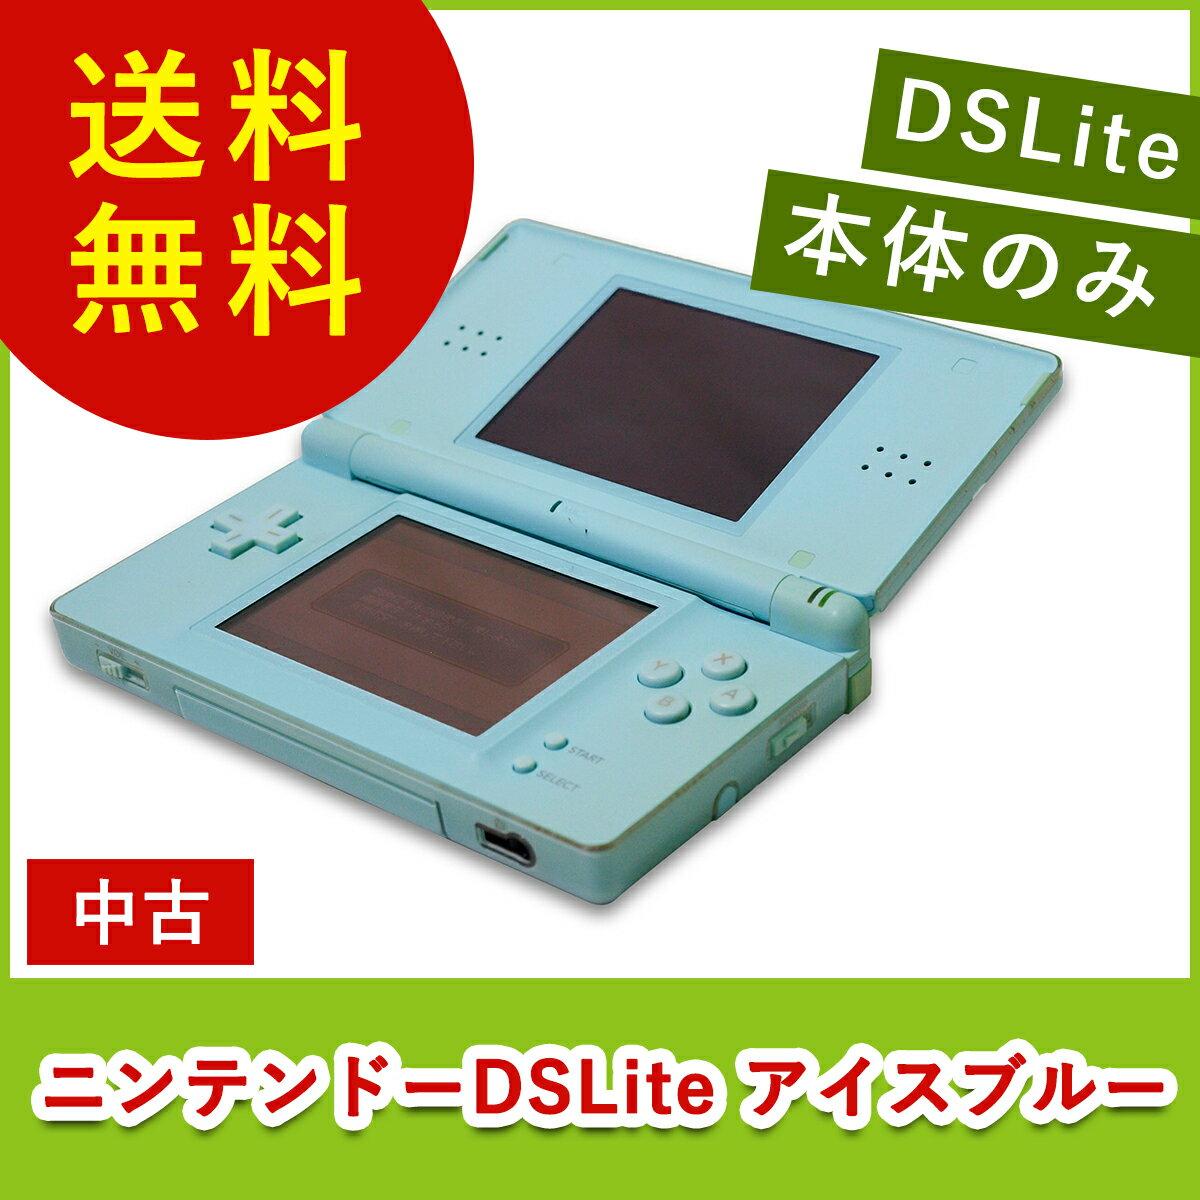 DSLite DSライト ニンテンドーDSLite 本体 中古 アイスブルー 青 アオ タッチペン付き Nintendo 任天堂 ニンテンドー 4902370512960 送料無料 USG-S-CBA 【中古】